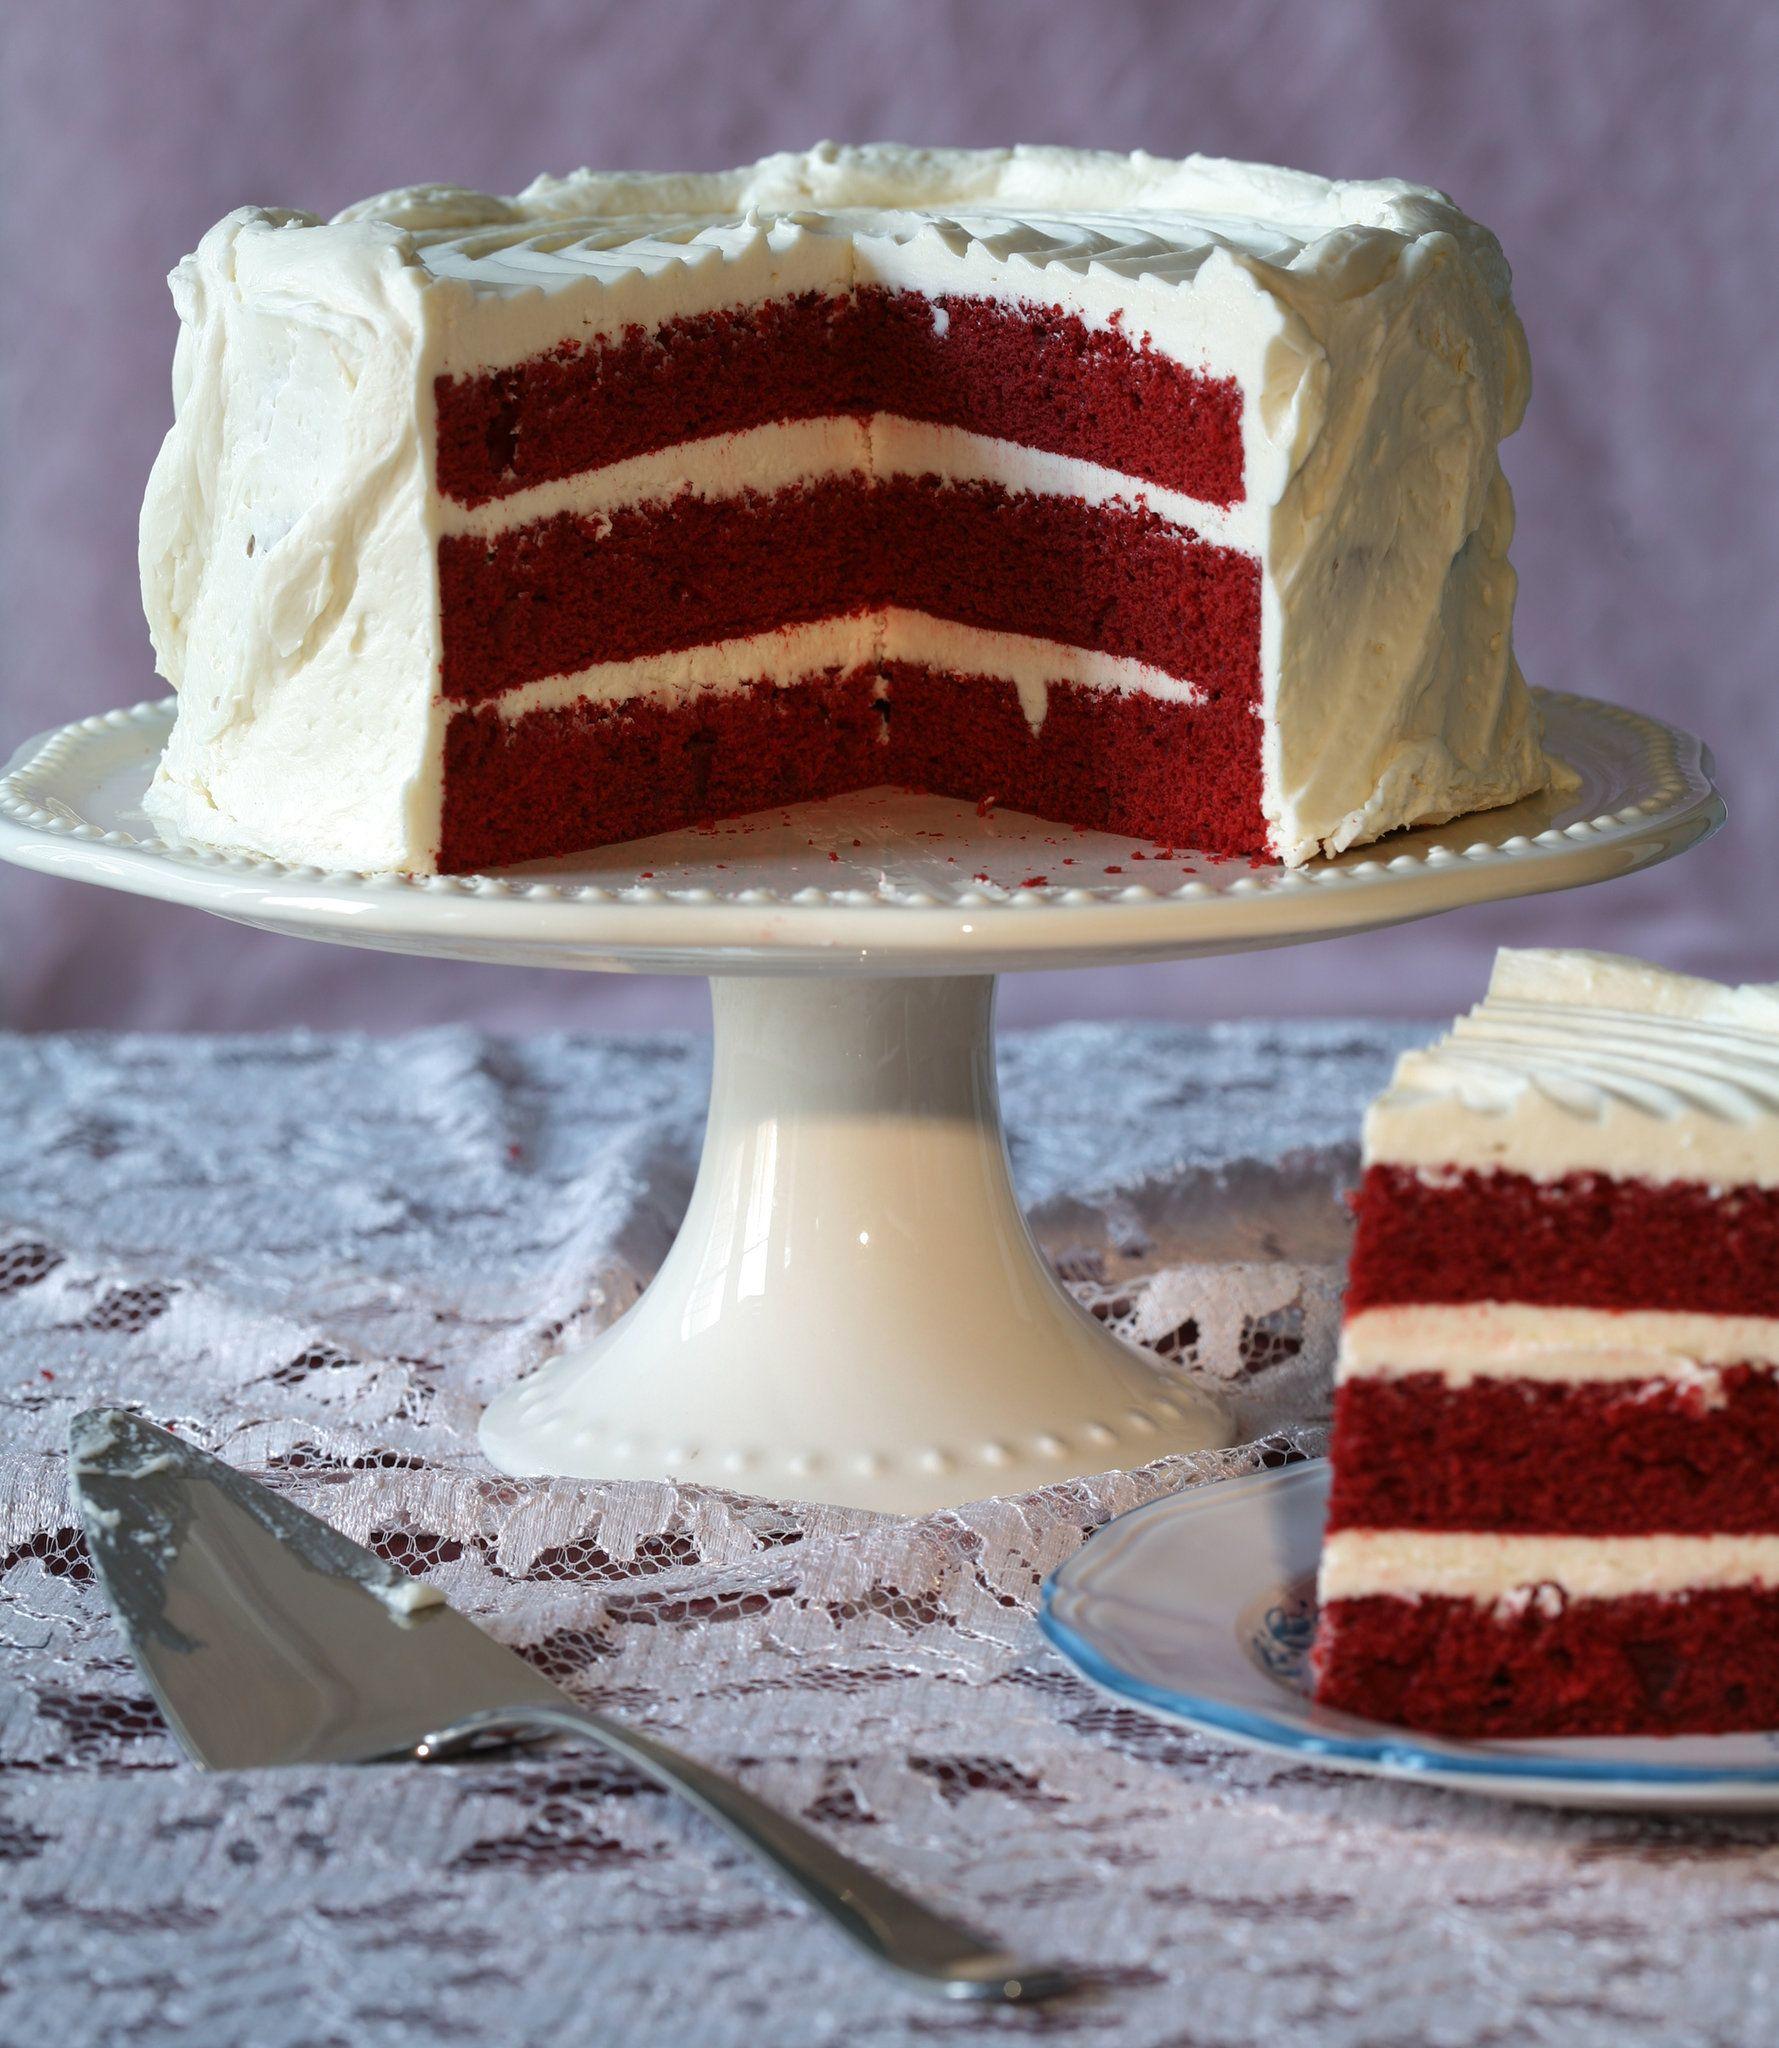 Red Velvet Cake Recipe Recipe Red Velvet Cake Recipe Red Velvet Wedding Cake Velvet Cake Recipes